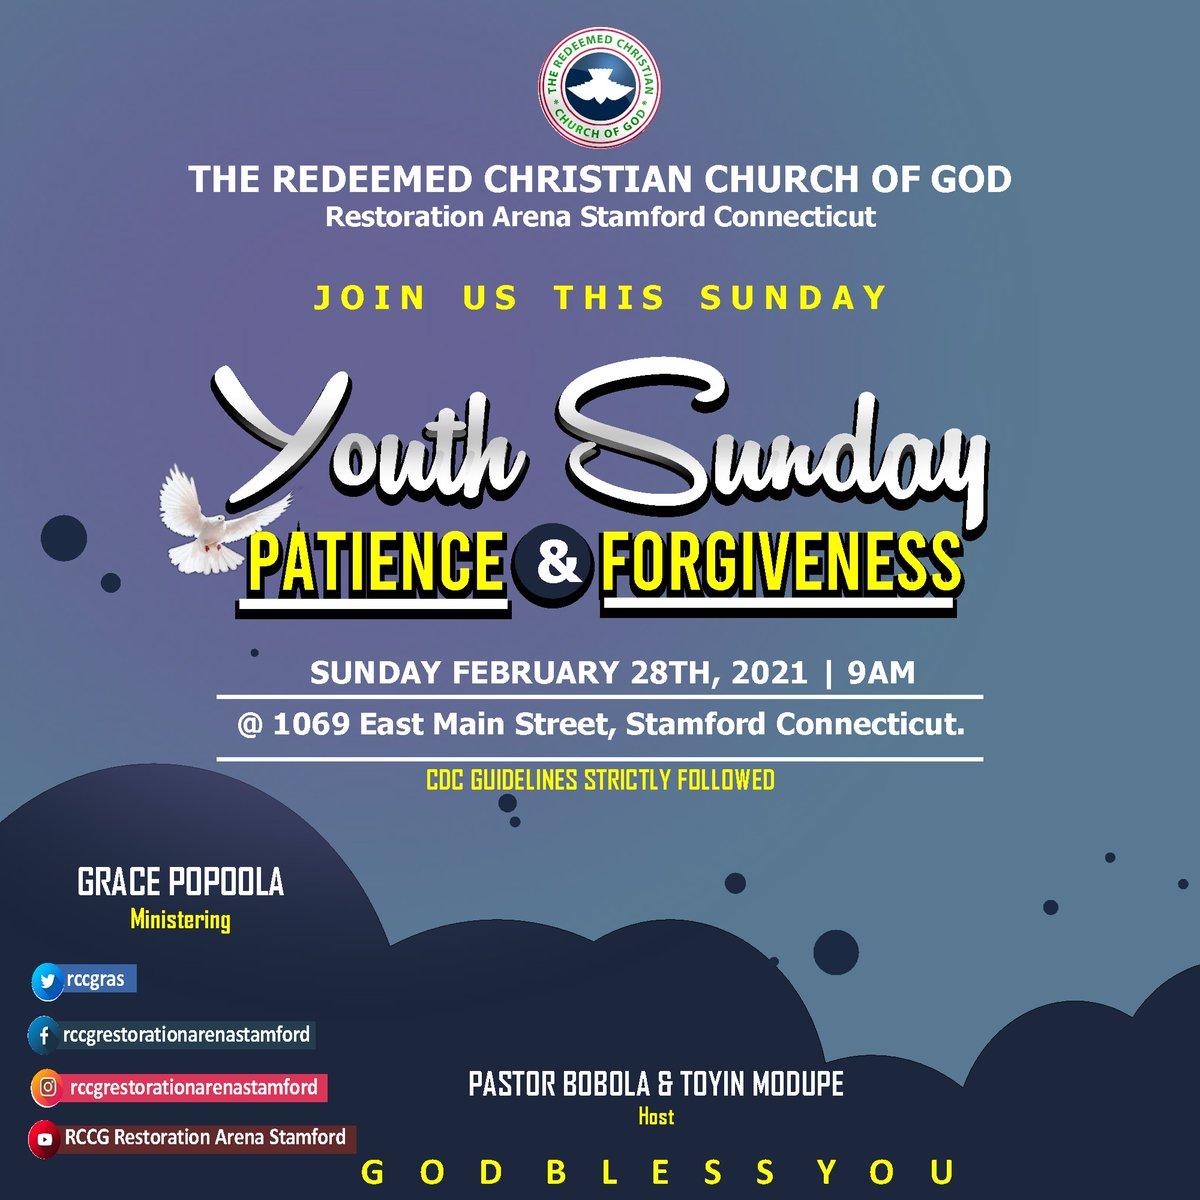 #Rccg  #RCCG #Christian #Sundayservice #SundayMotivation #sundayworship Steam live !!! Thanks